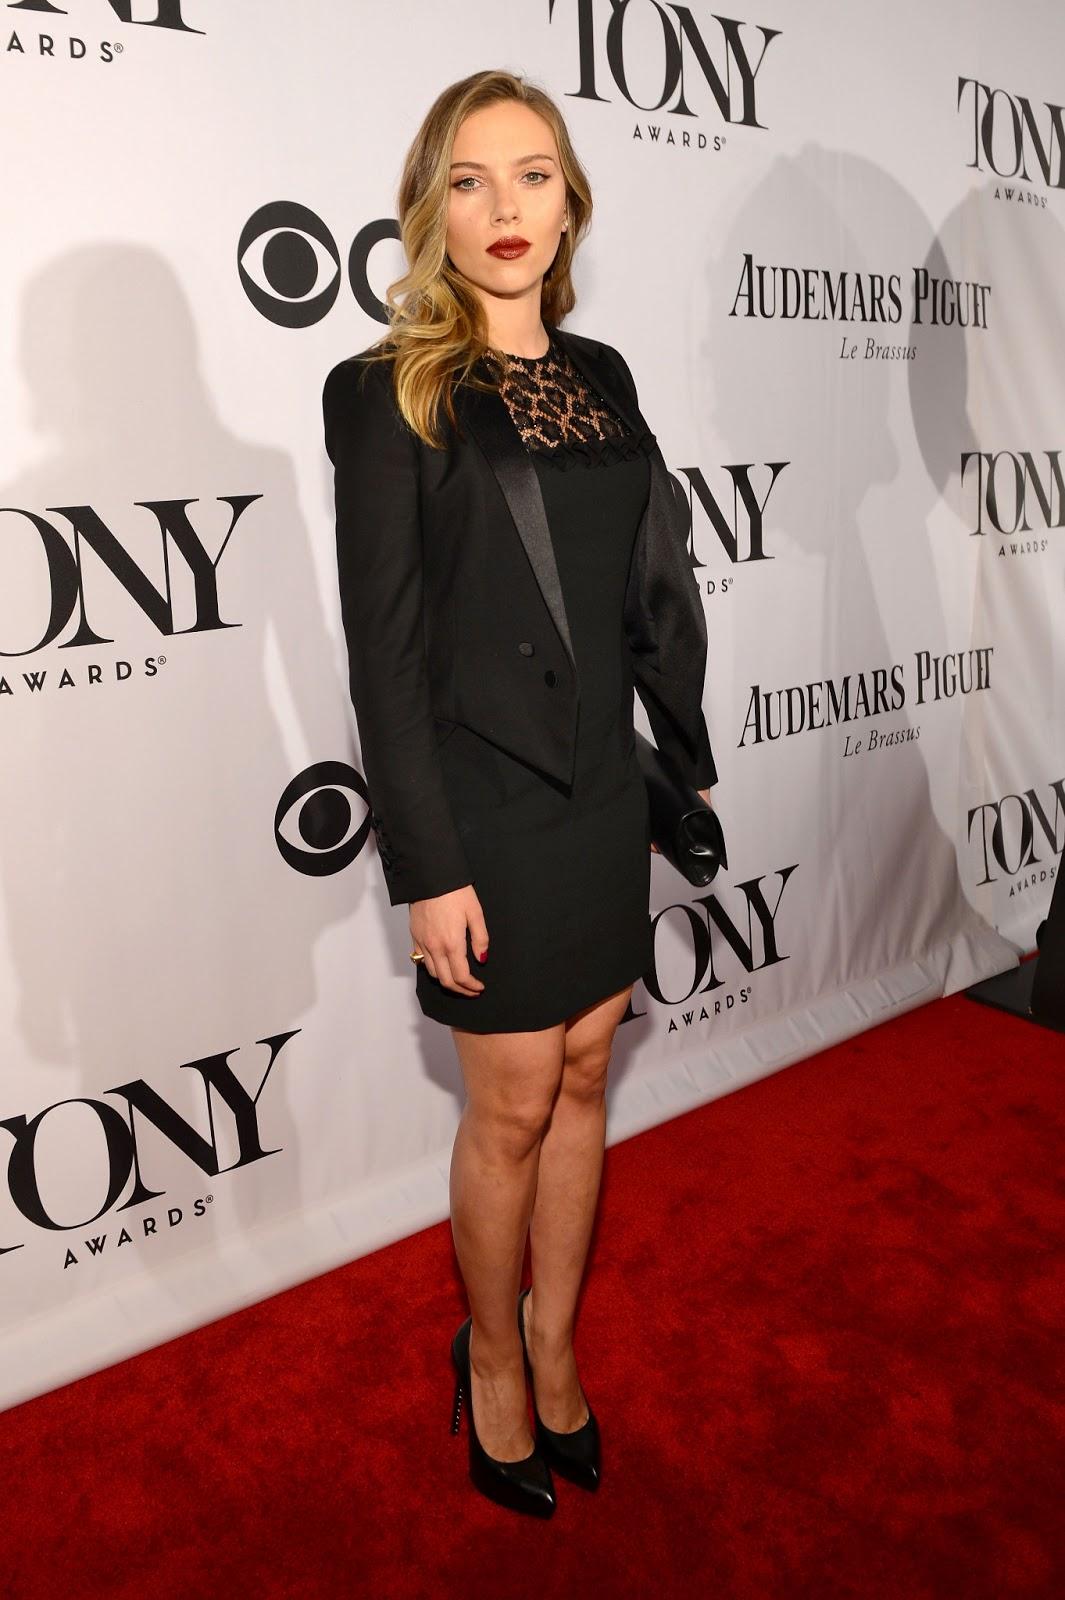 http://2.bp.blogspot.com/-o5RpdZoghlc/UbaCeBC-lAI/AAAAAAAAgmo/ZDUrJvSSsQQ/s1600/Scarlett+Johansson+at+The+67th+Annual+Tony+Awards+Red+Carpet+-+June+9,+2013+-05.jpg